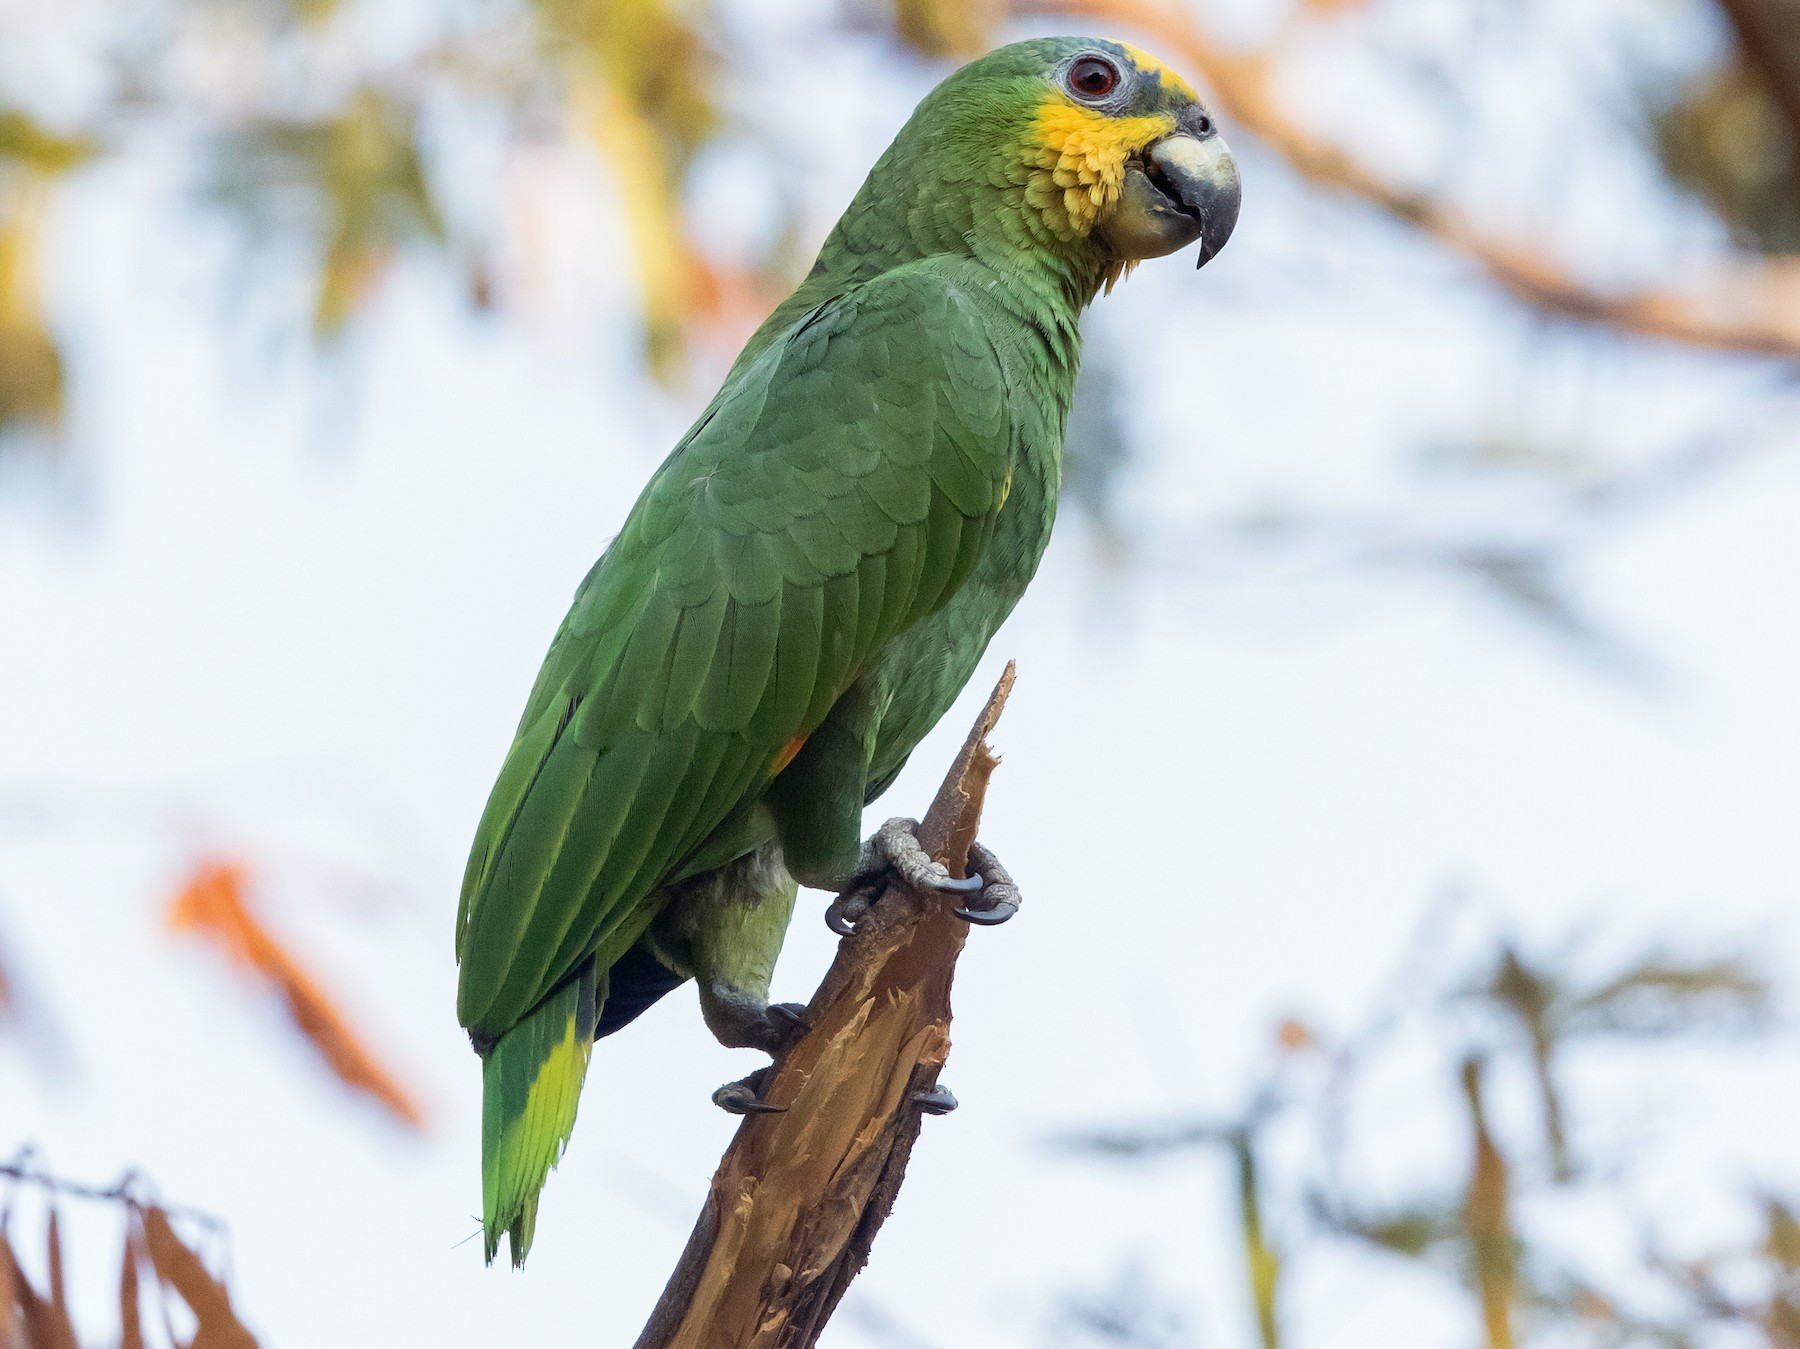 Orange-winged Parrot - John Nolley